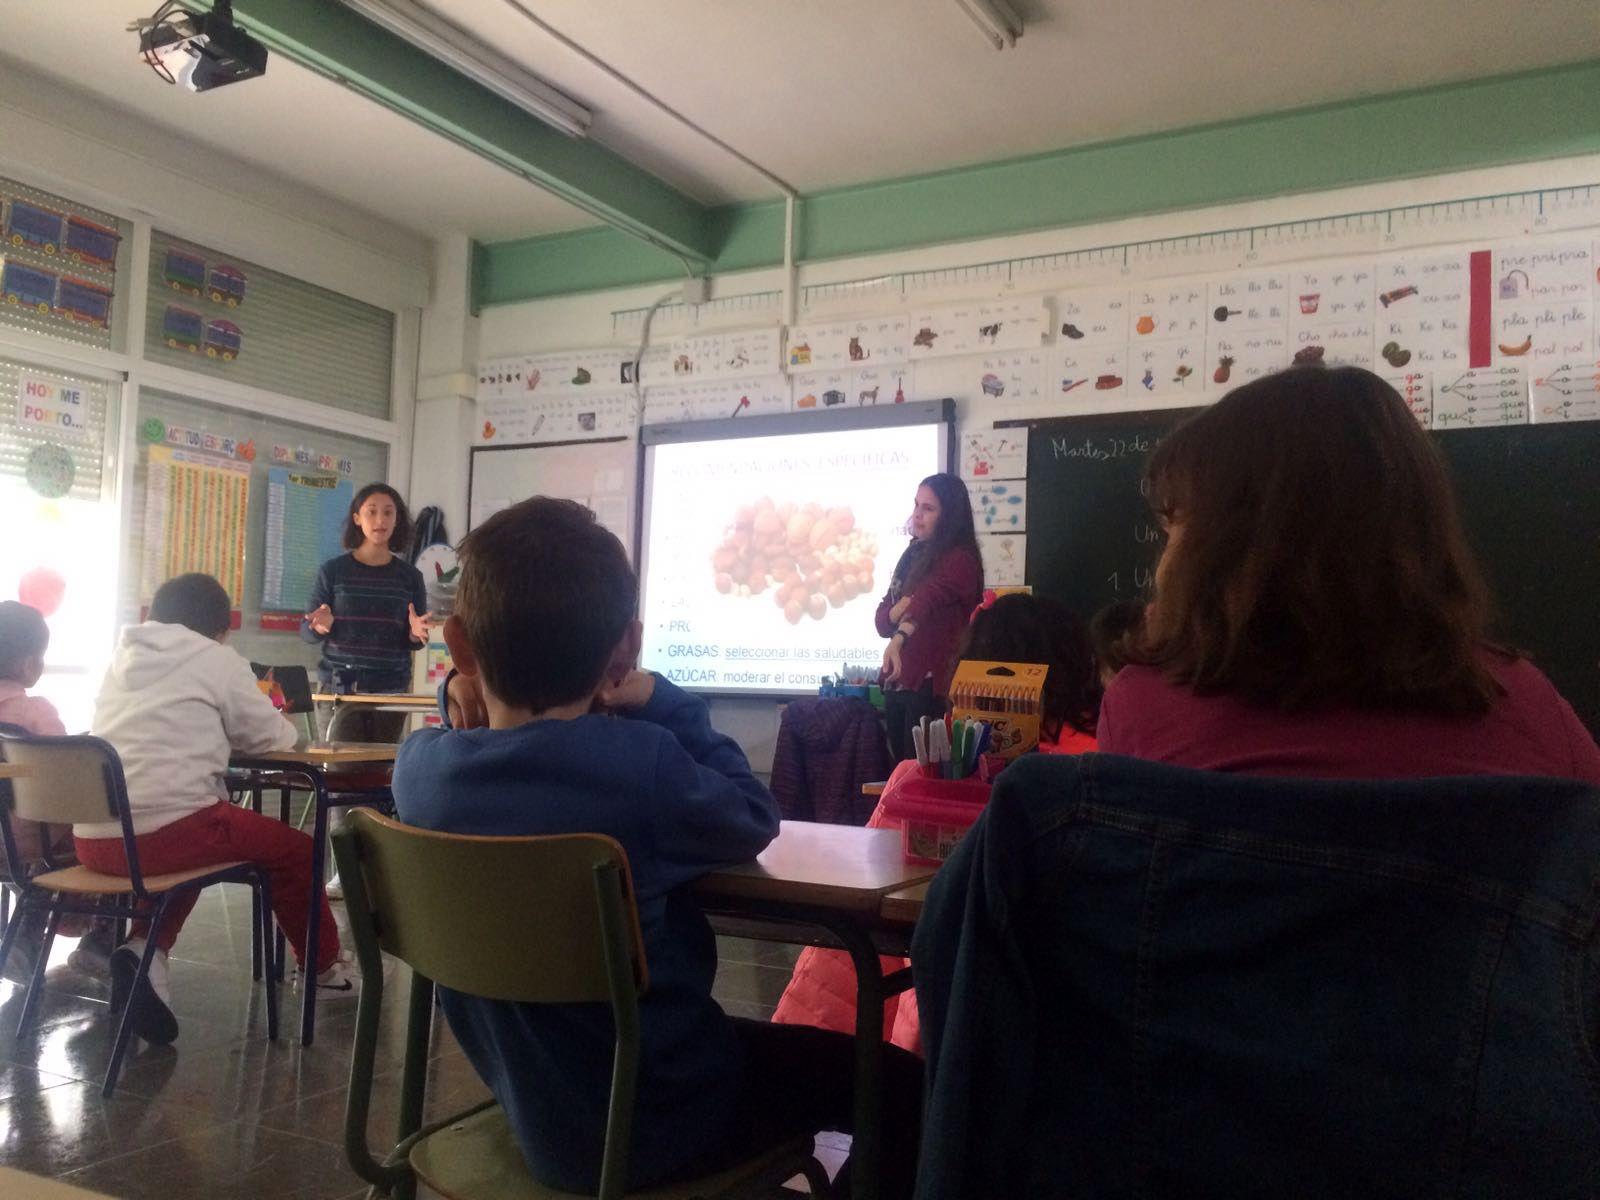 ceu-talleres-saludables-escolares-2